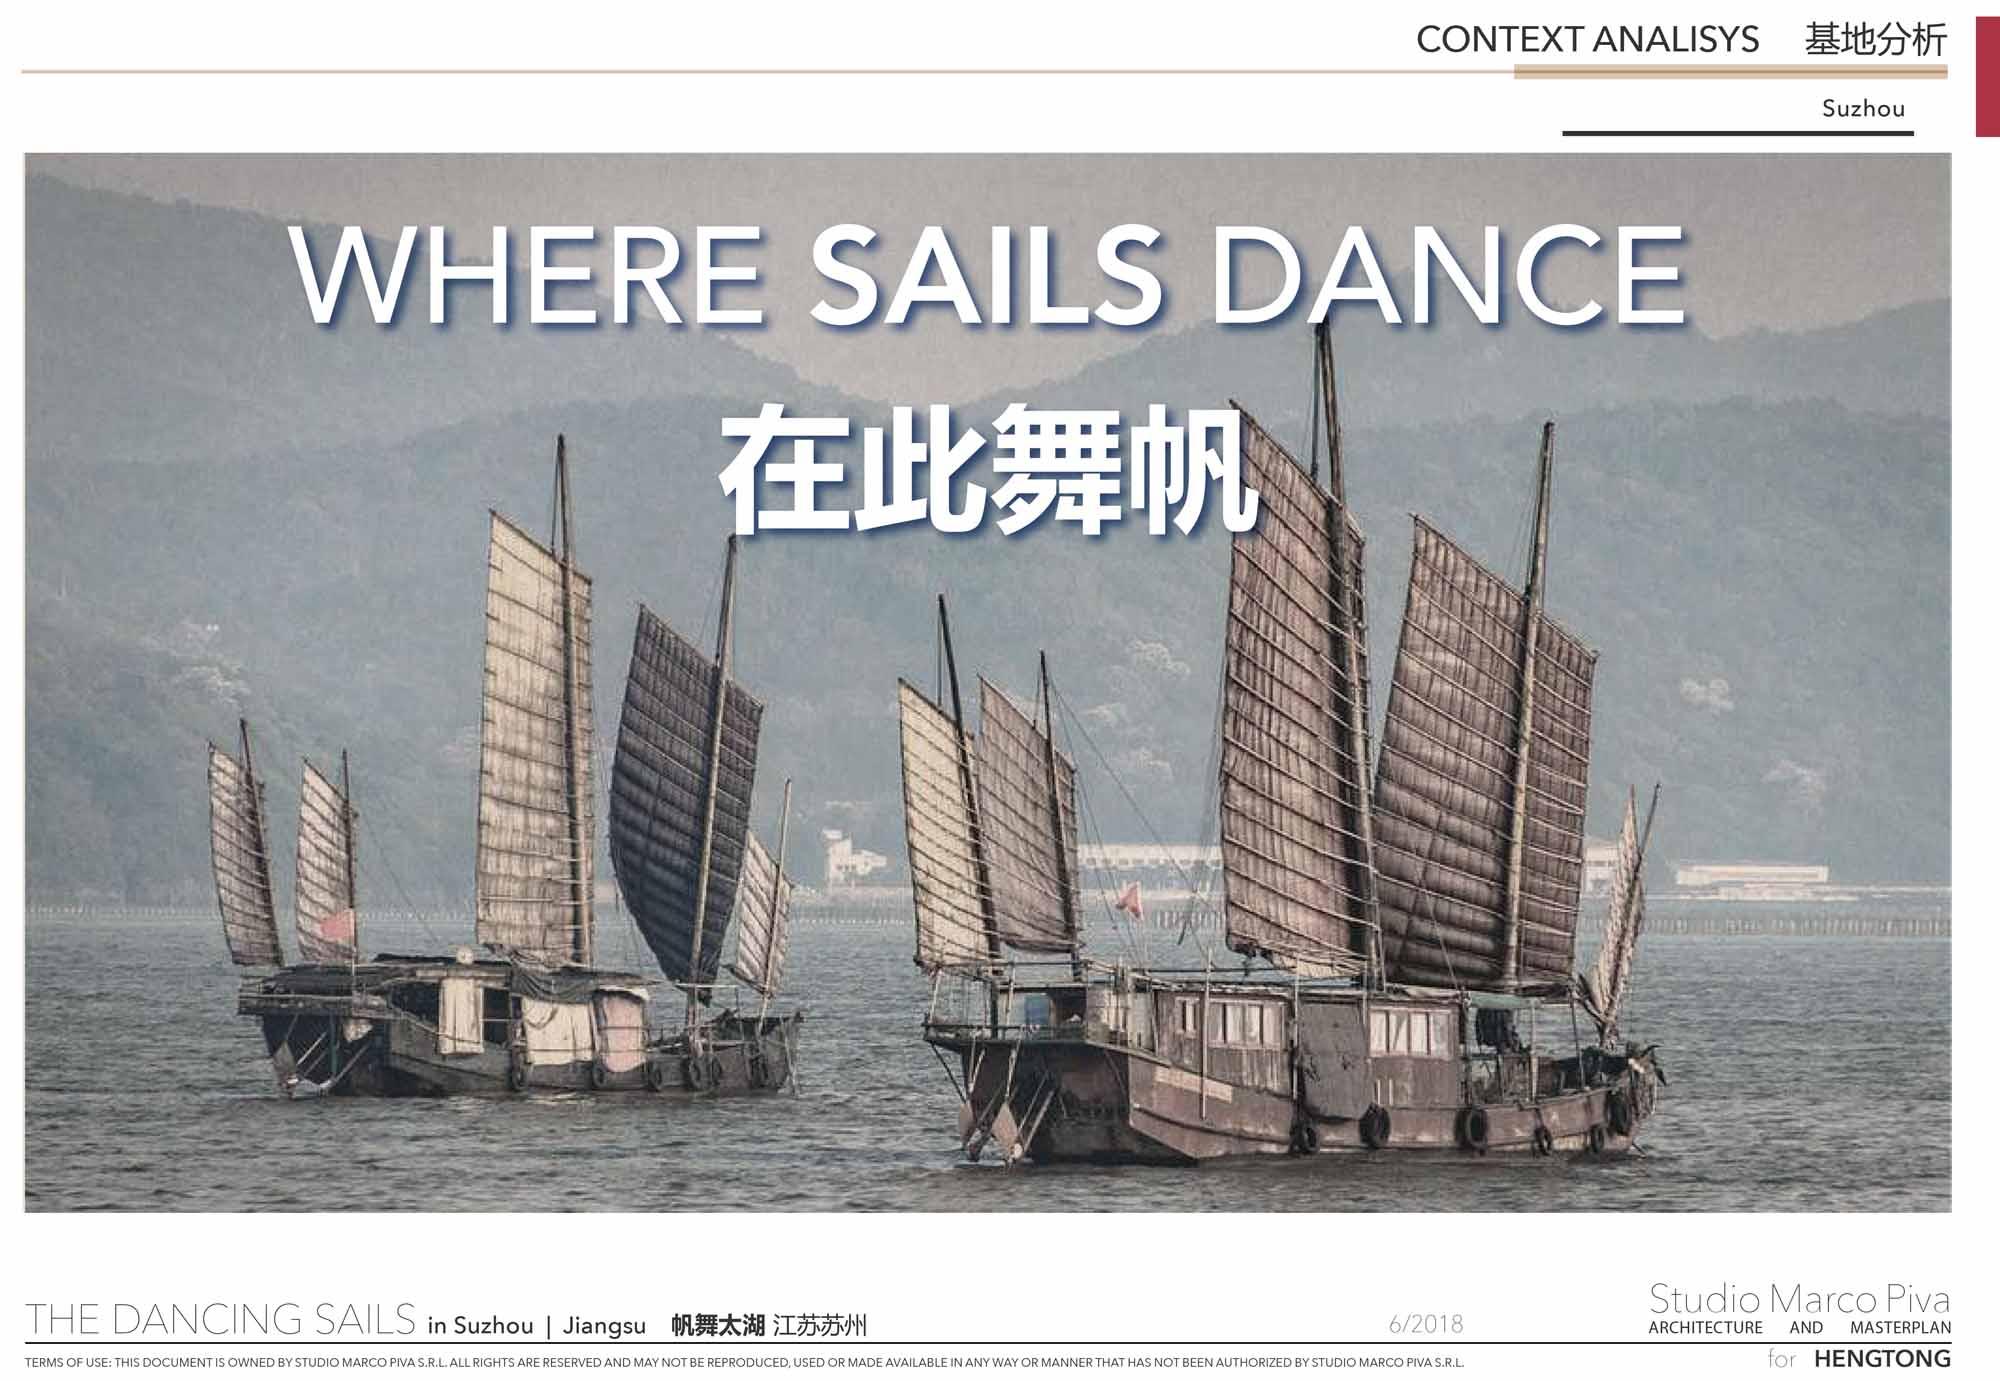 Dancing Sails Concept Studio Marco Piva}